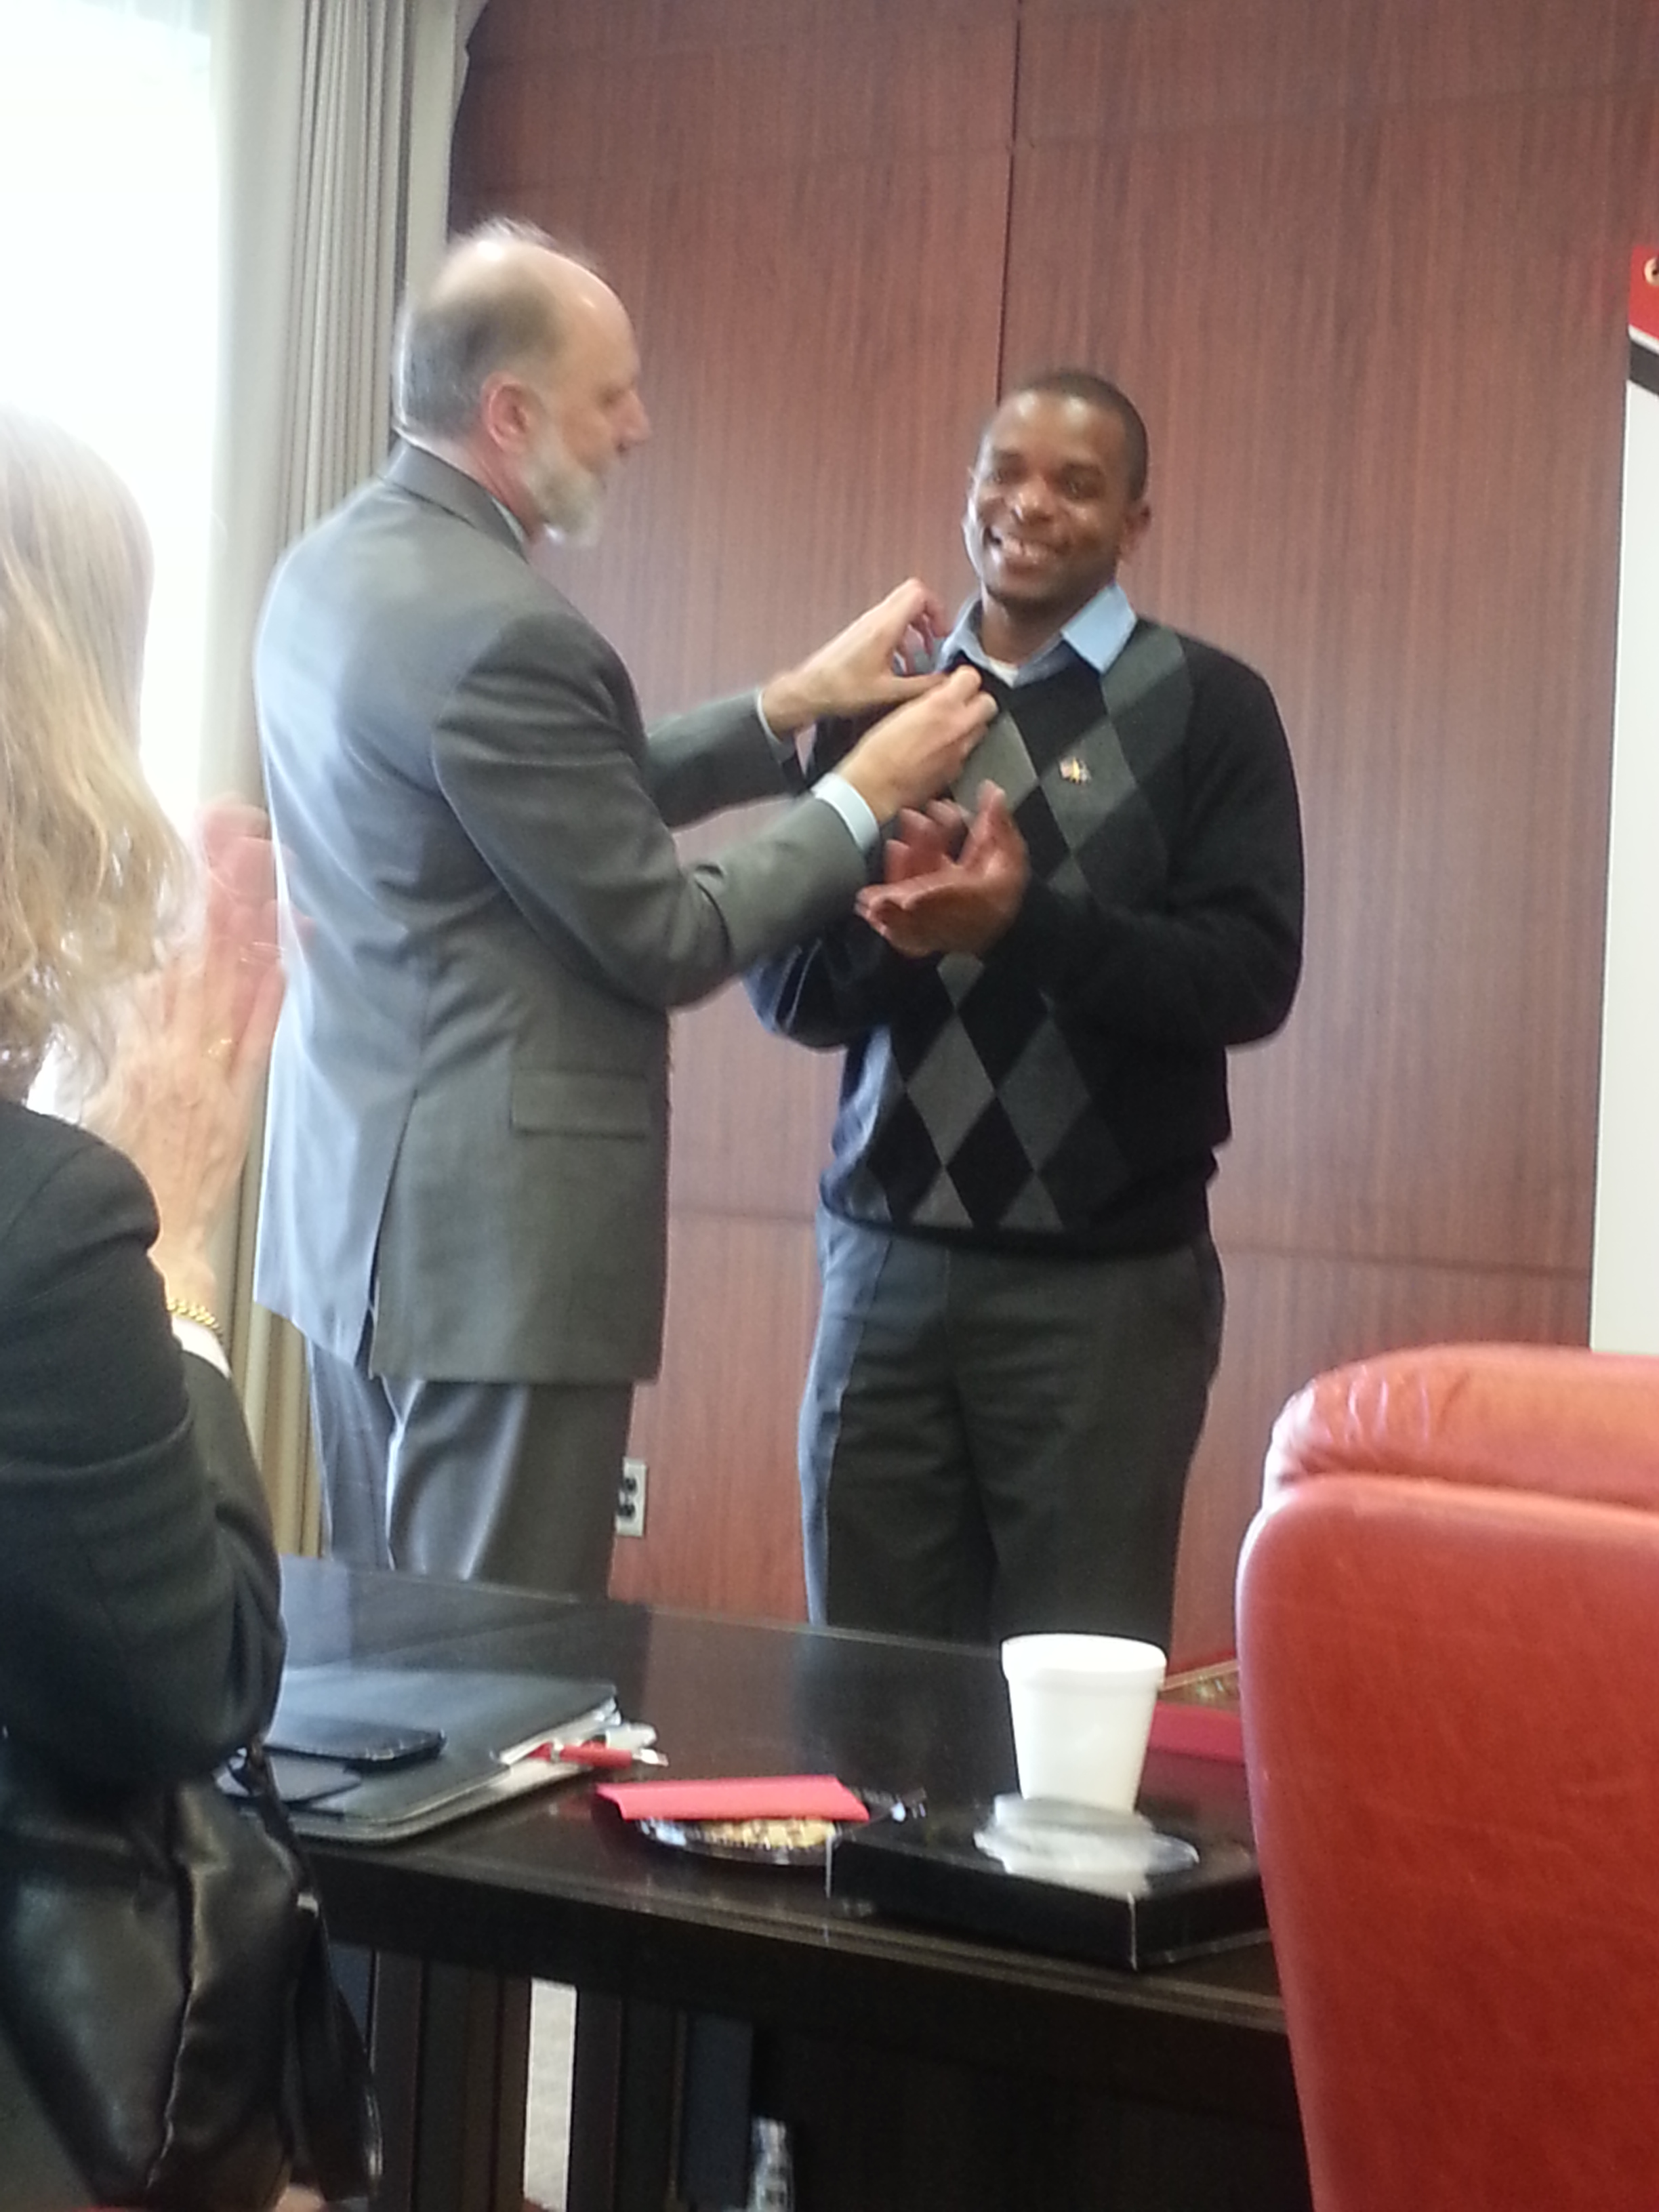 President Baker presenting delegate Bernard with his NIU sport pin